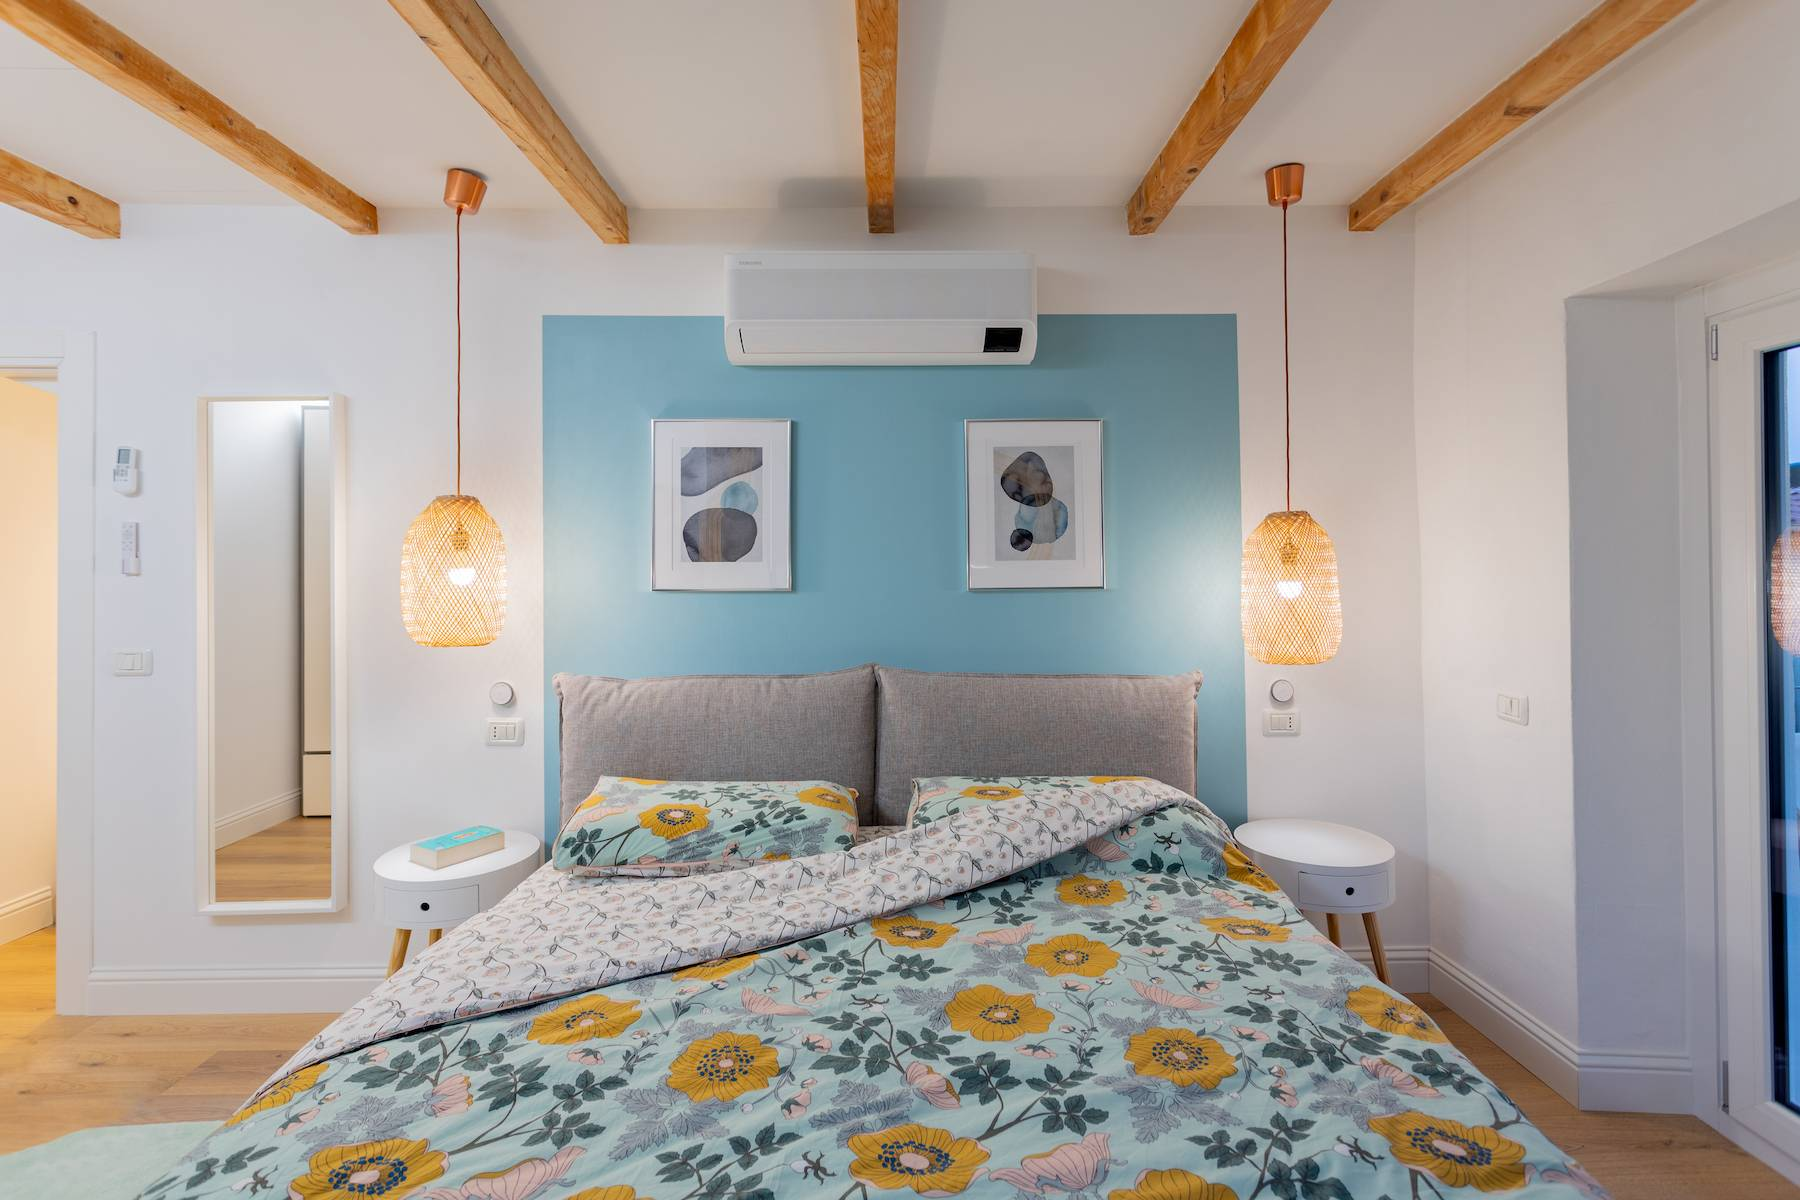 Appartamento in Vendita a Belgirate: 3 locali, 62 mq - Foto 16